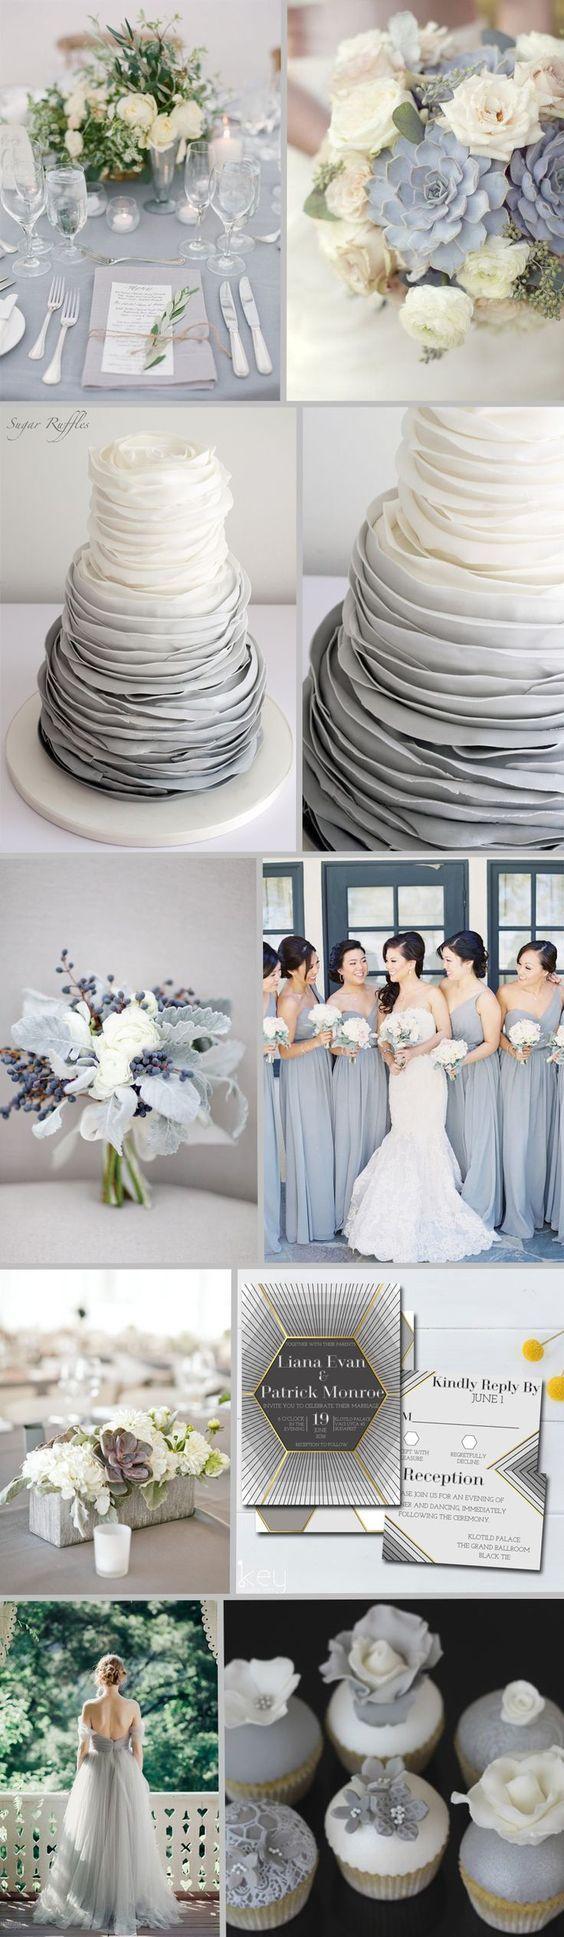 FiftyFlowers - Dove Gray Wedding Inspiration